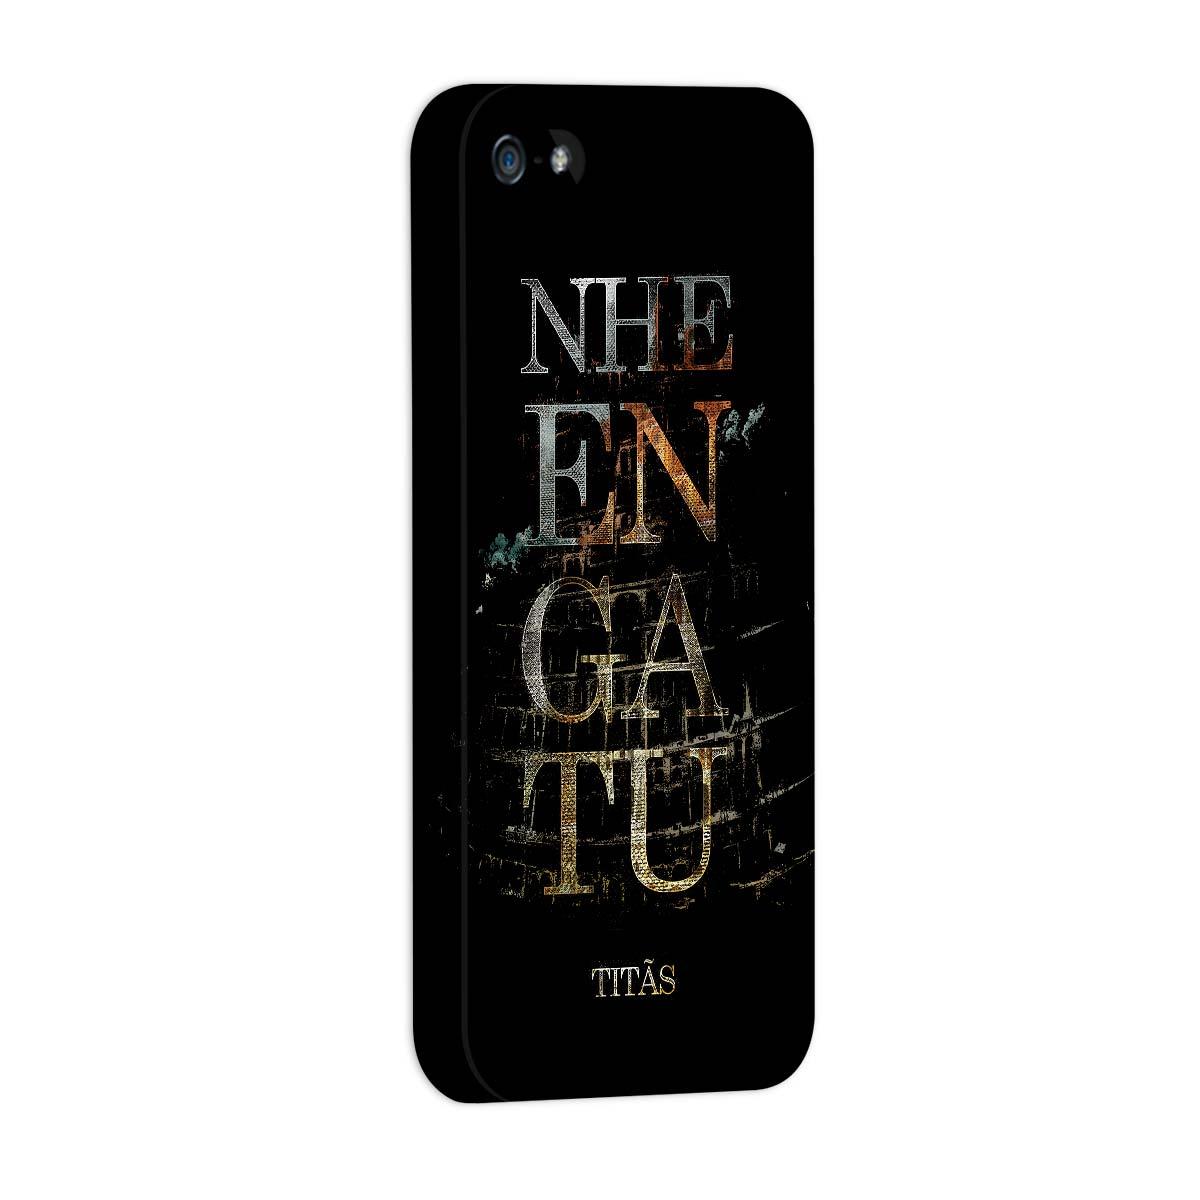 Capa Para iPhone 5/5S Titãs Nheengatu